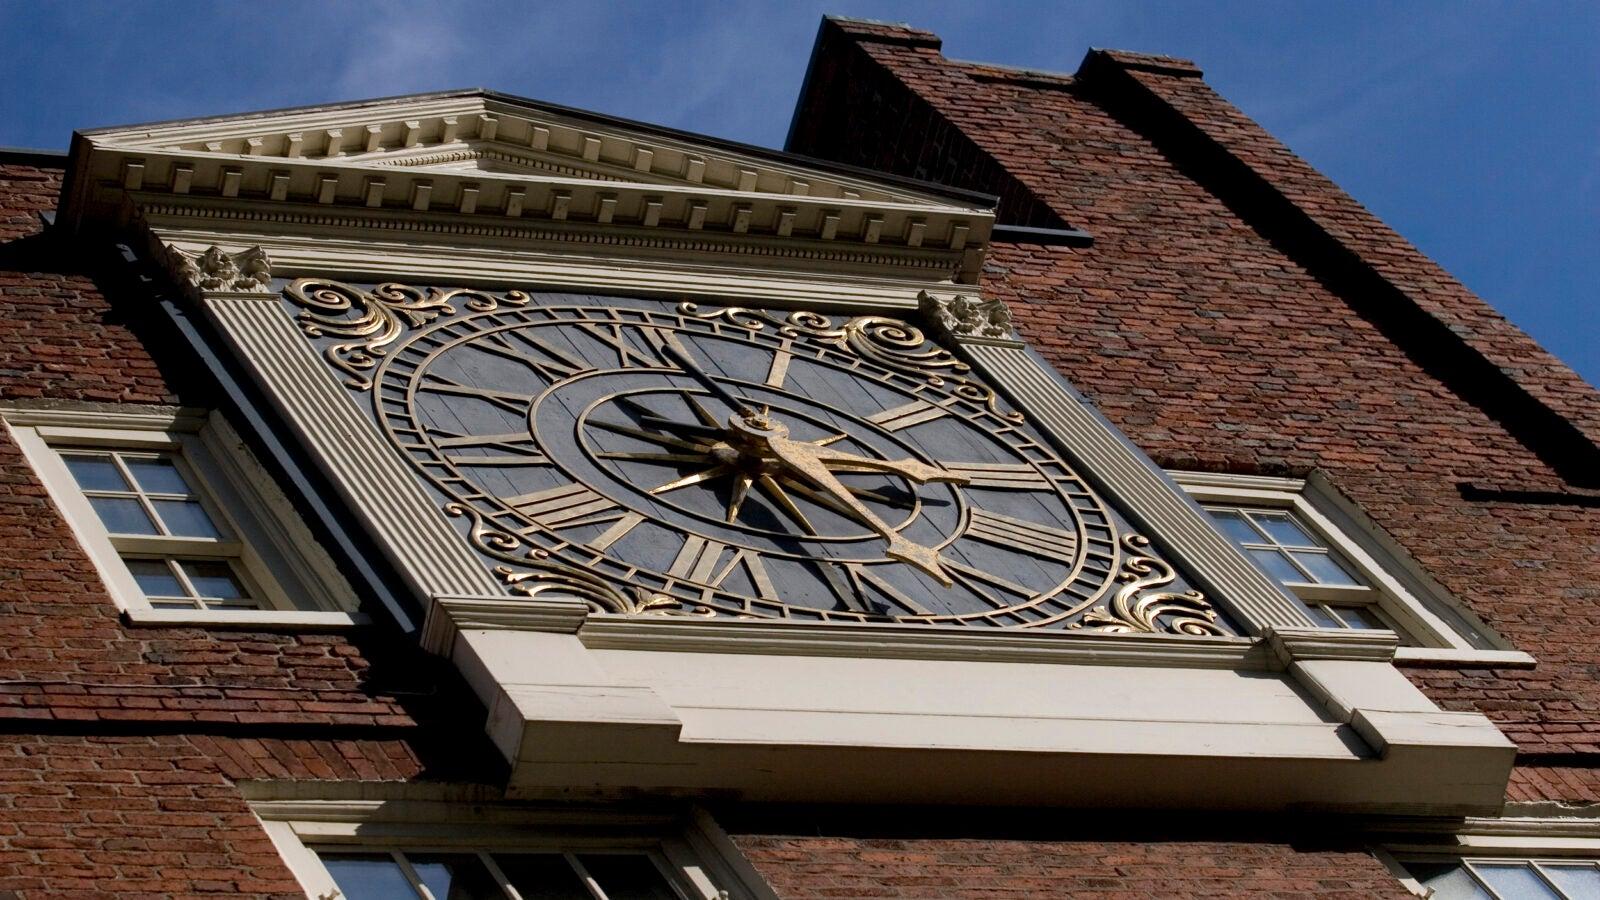 The Massachusetts Hall clock in 2015.